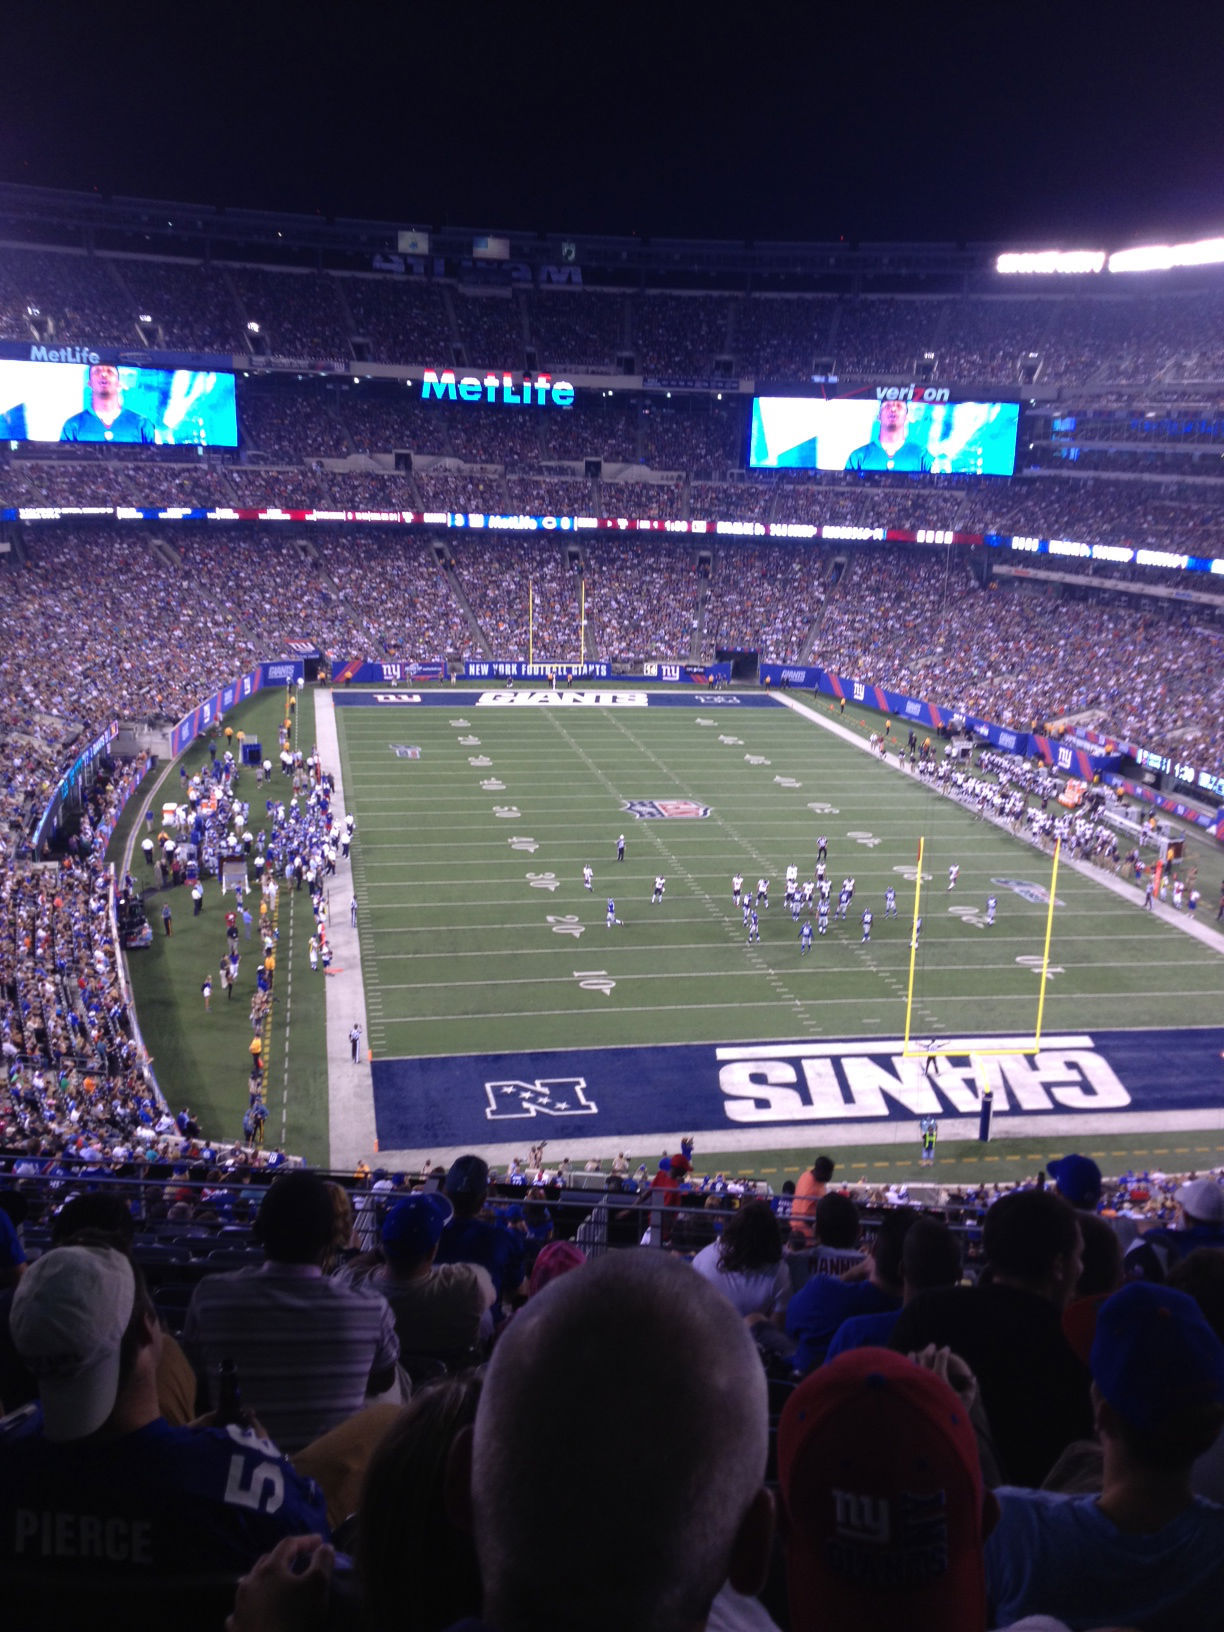 955cd3dc569c3b1c7ff9_stadium.jpg